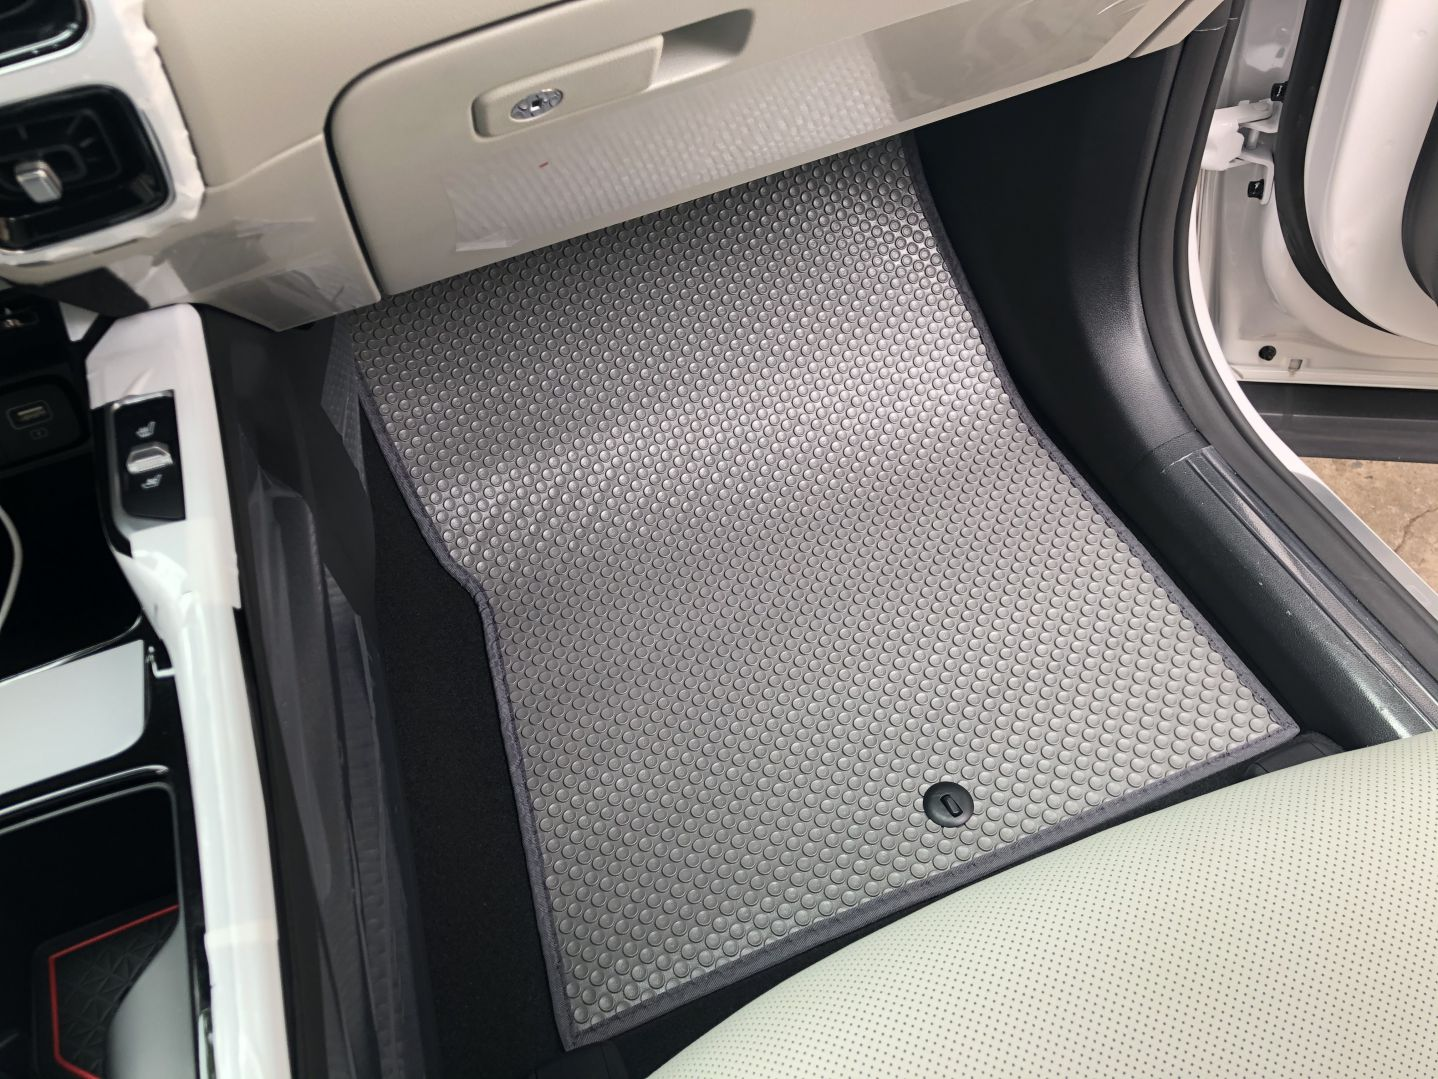 Thảm BackLiners màu grey Kia Sorento 2021